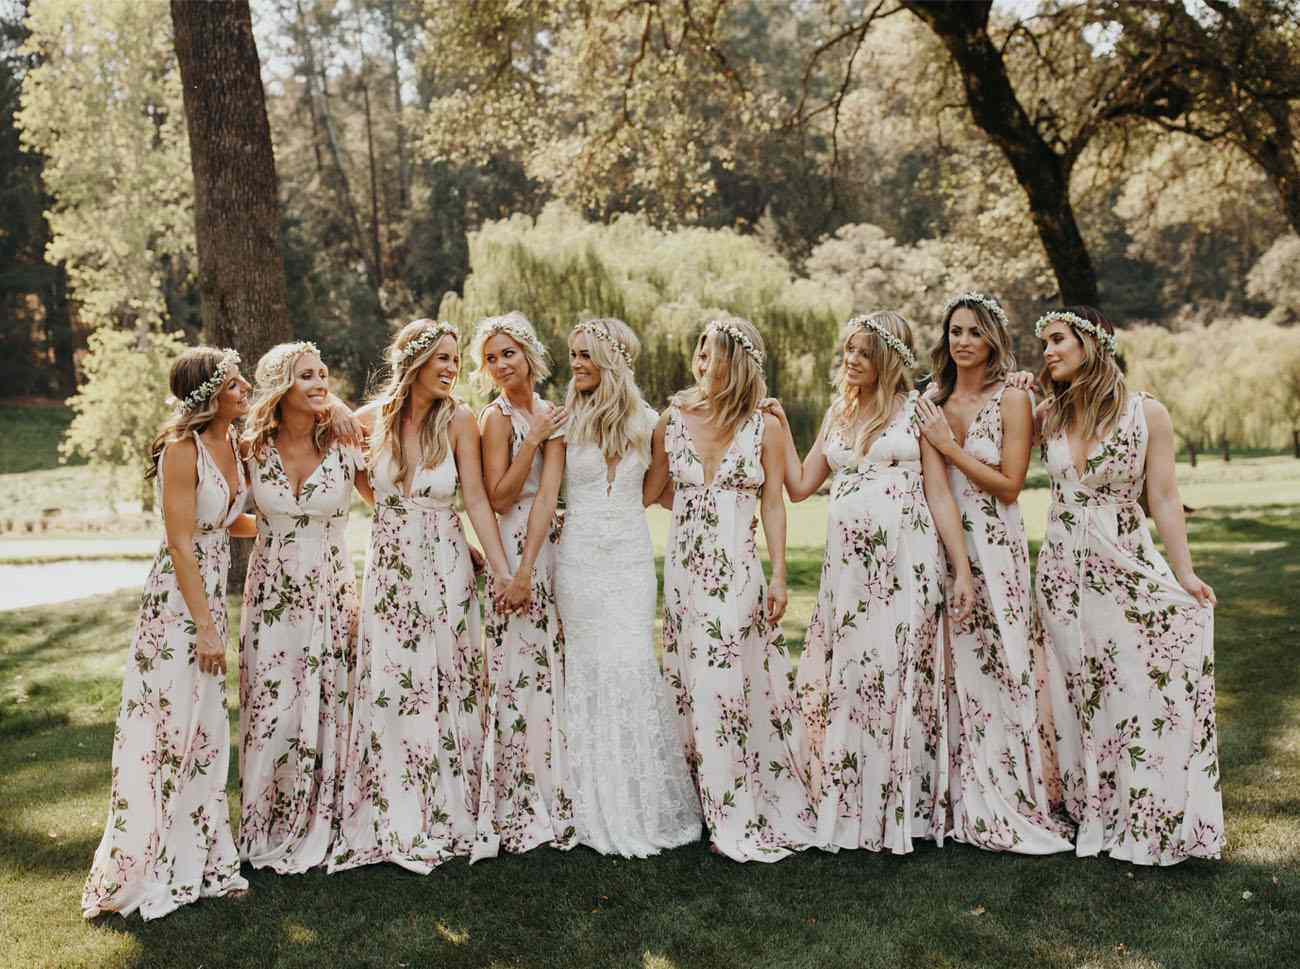 bridesmaids in flower crowns